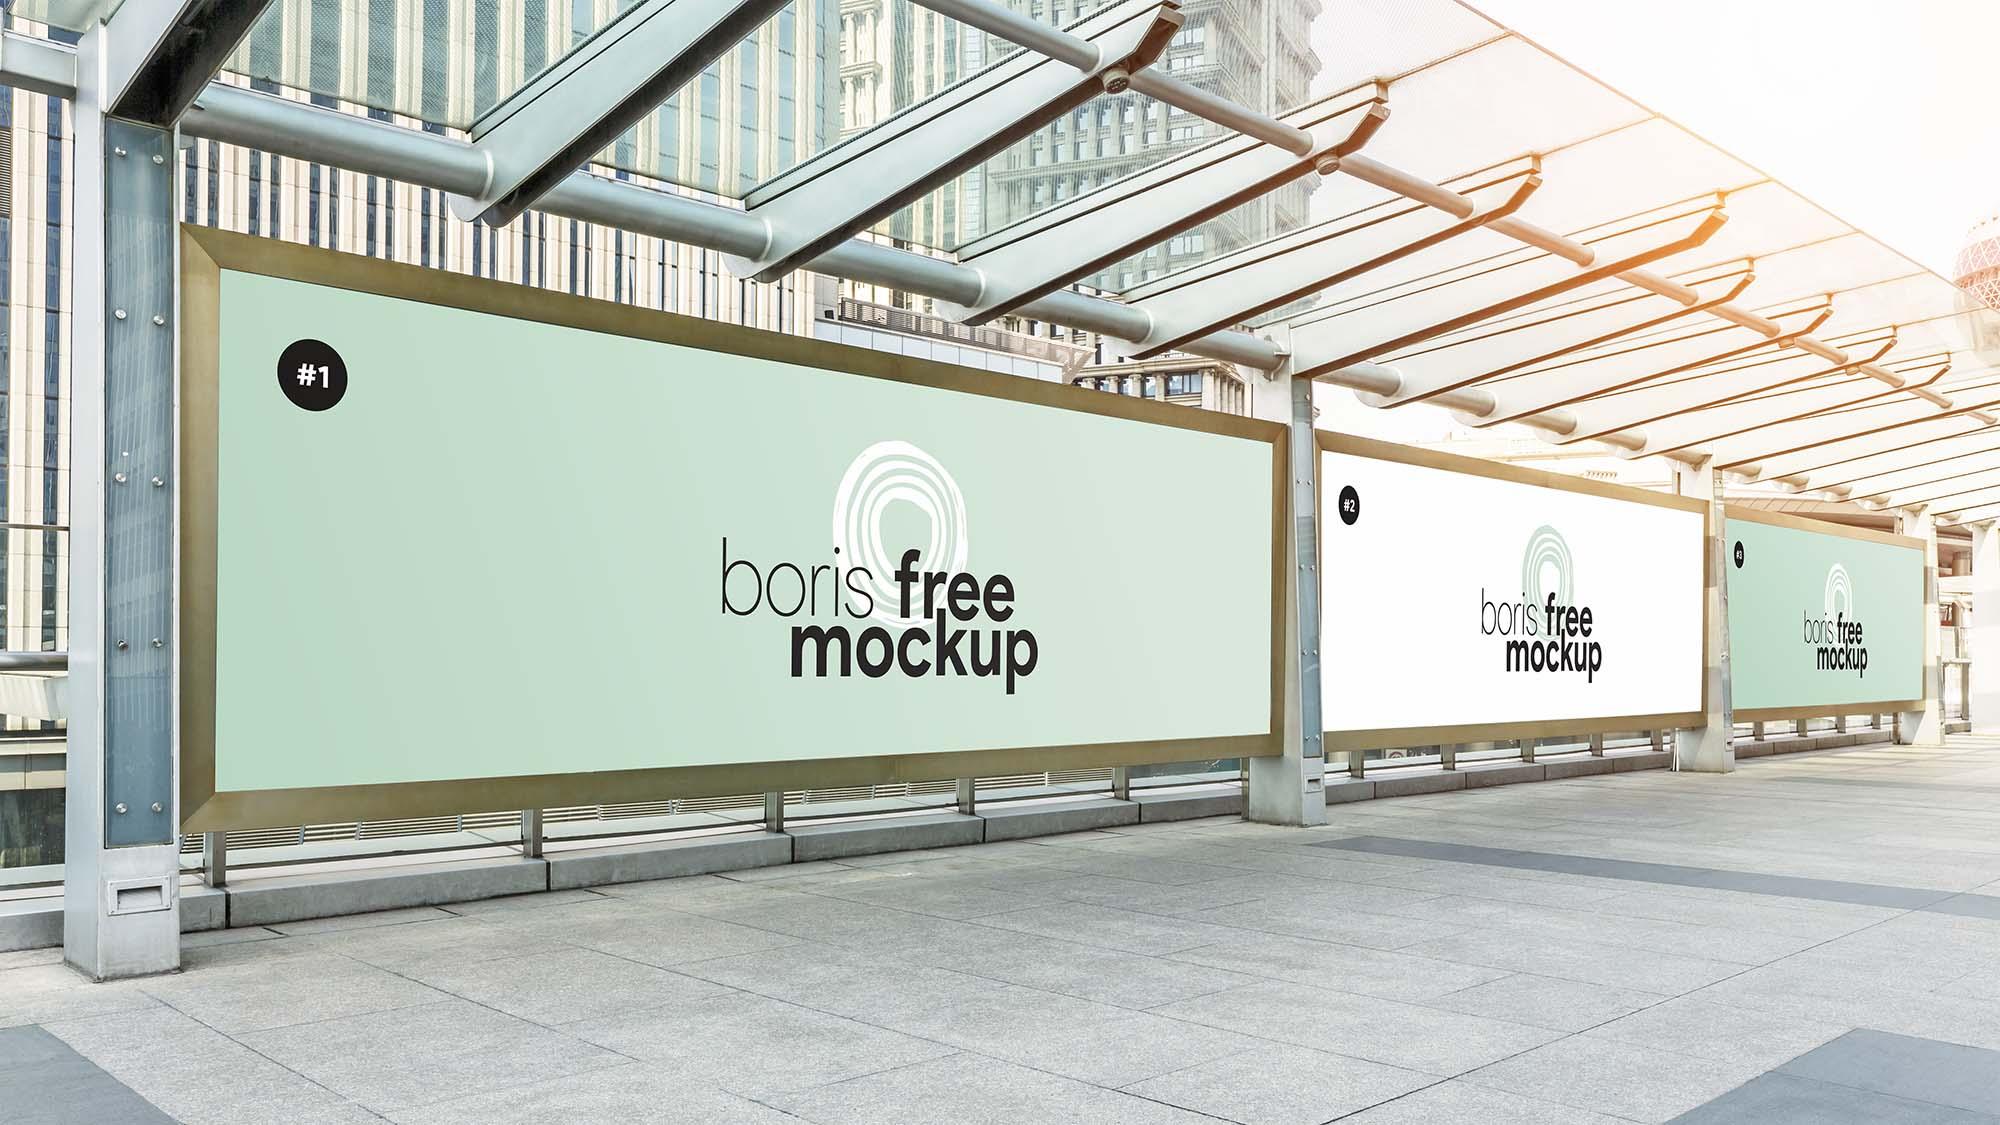 Bus Stop Advertising Poster Mockup